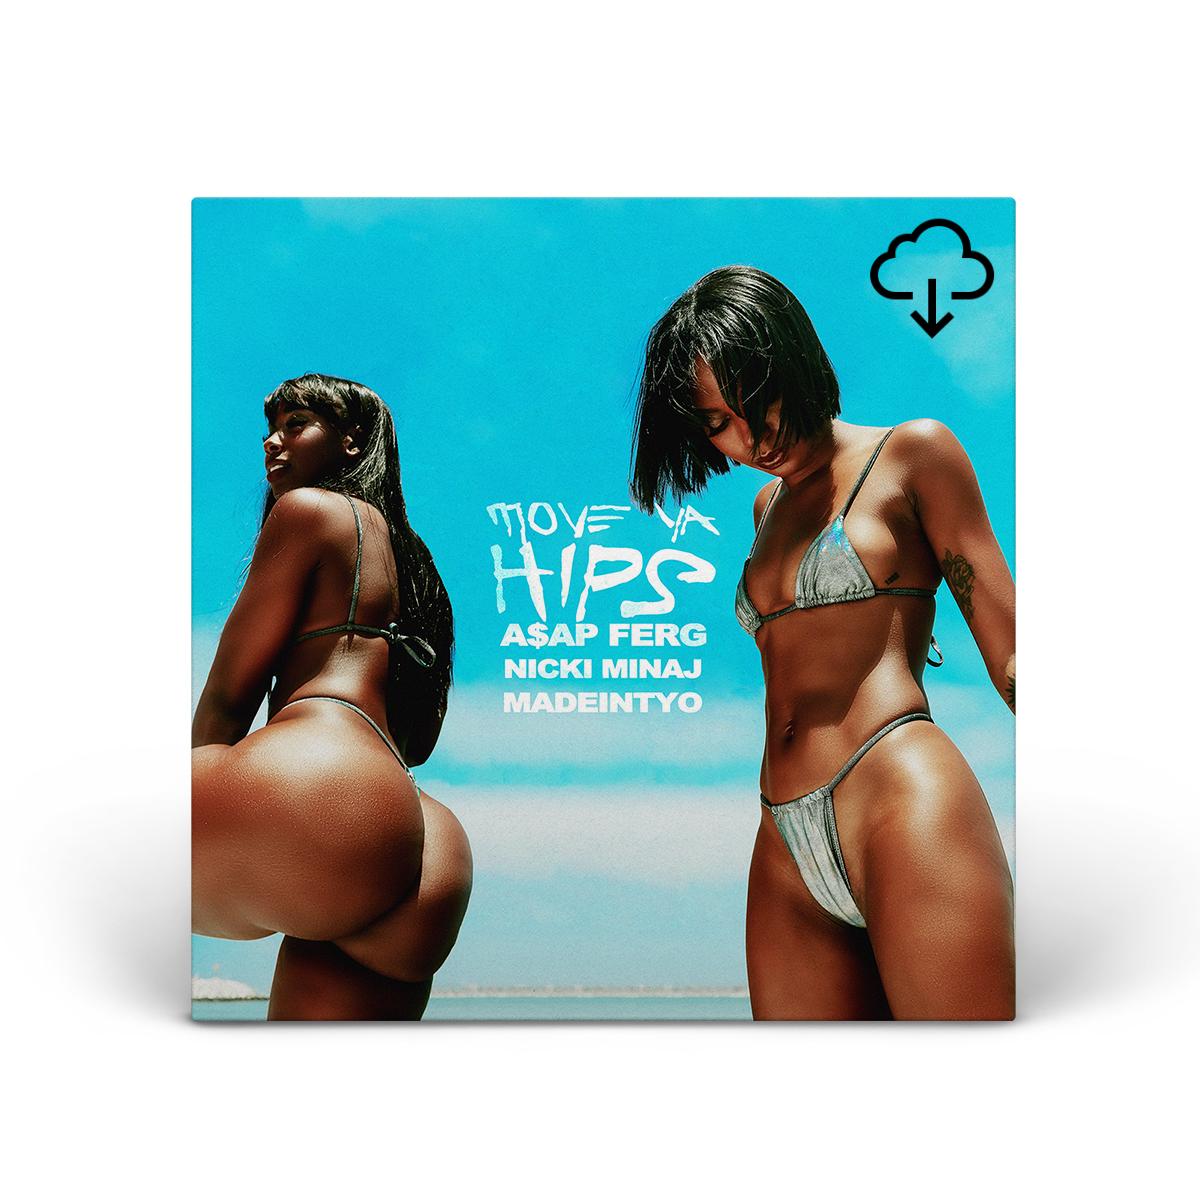 Move Ya Hips feat. Nicki Minaj & MadeinTYO Digital Single Download